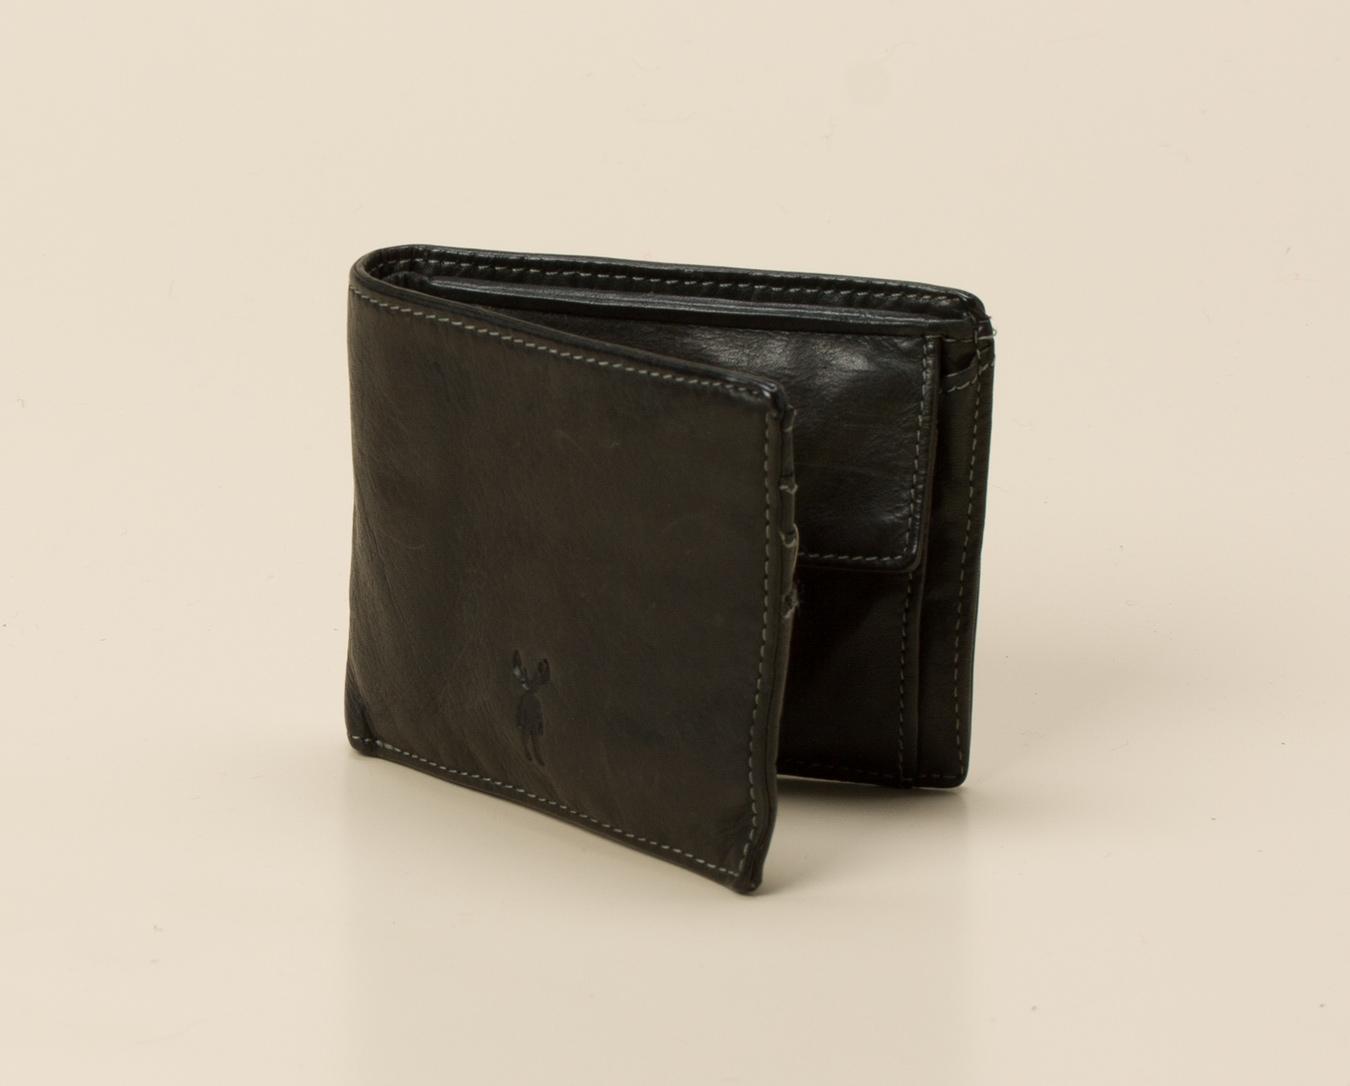 ed8a5c4f4f197 Jack Kinsky Herren-Acces. Portemonnaie in grau kaufen